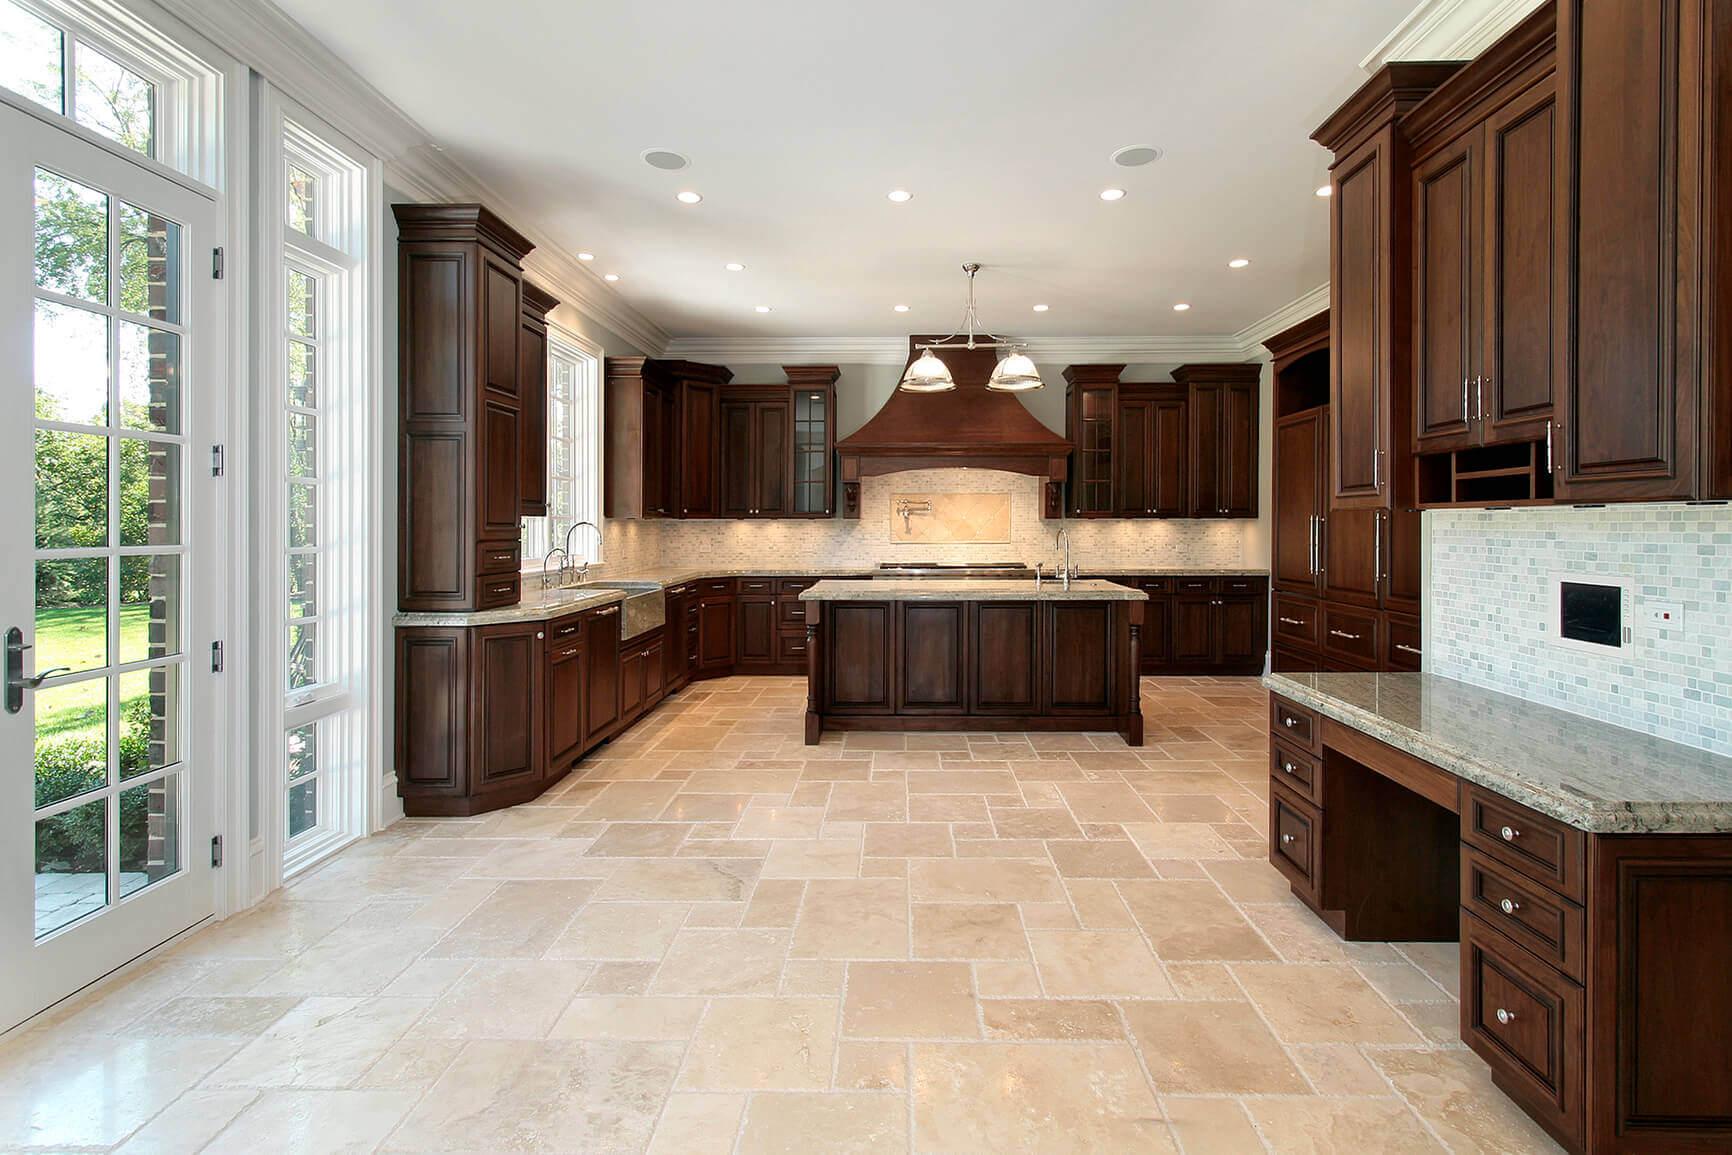 Contemporary Kitchen Floor Tile Ideas